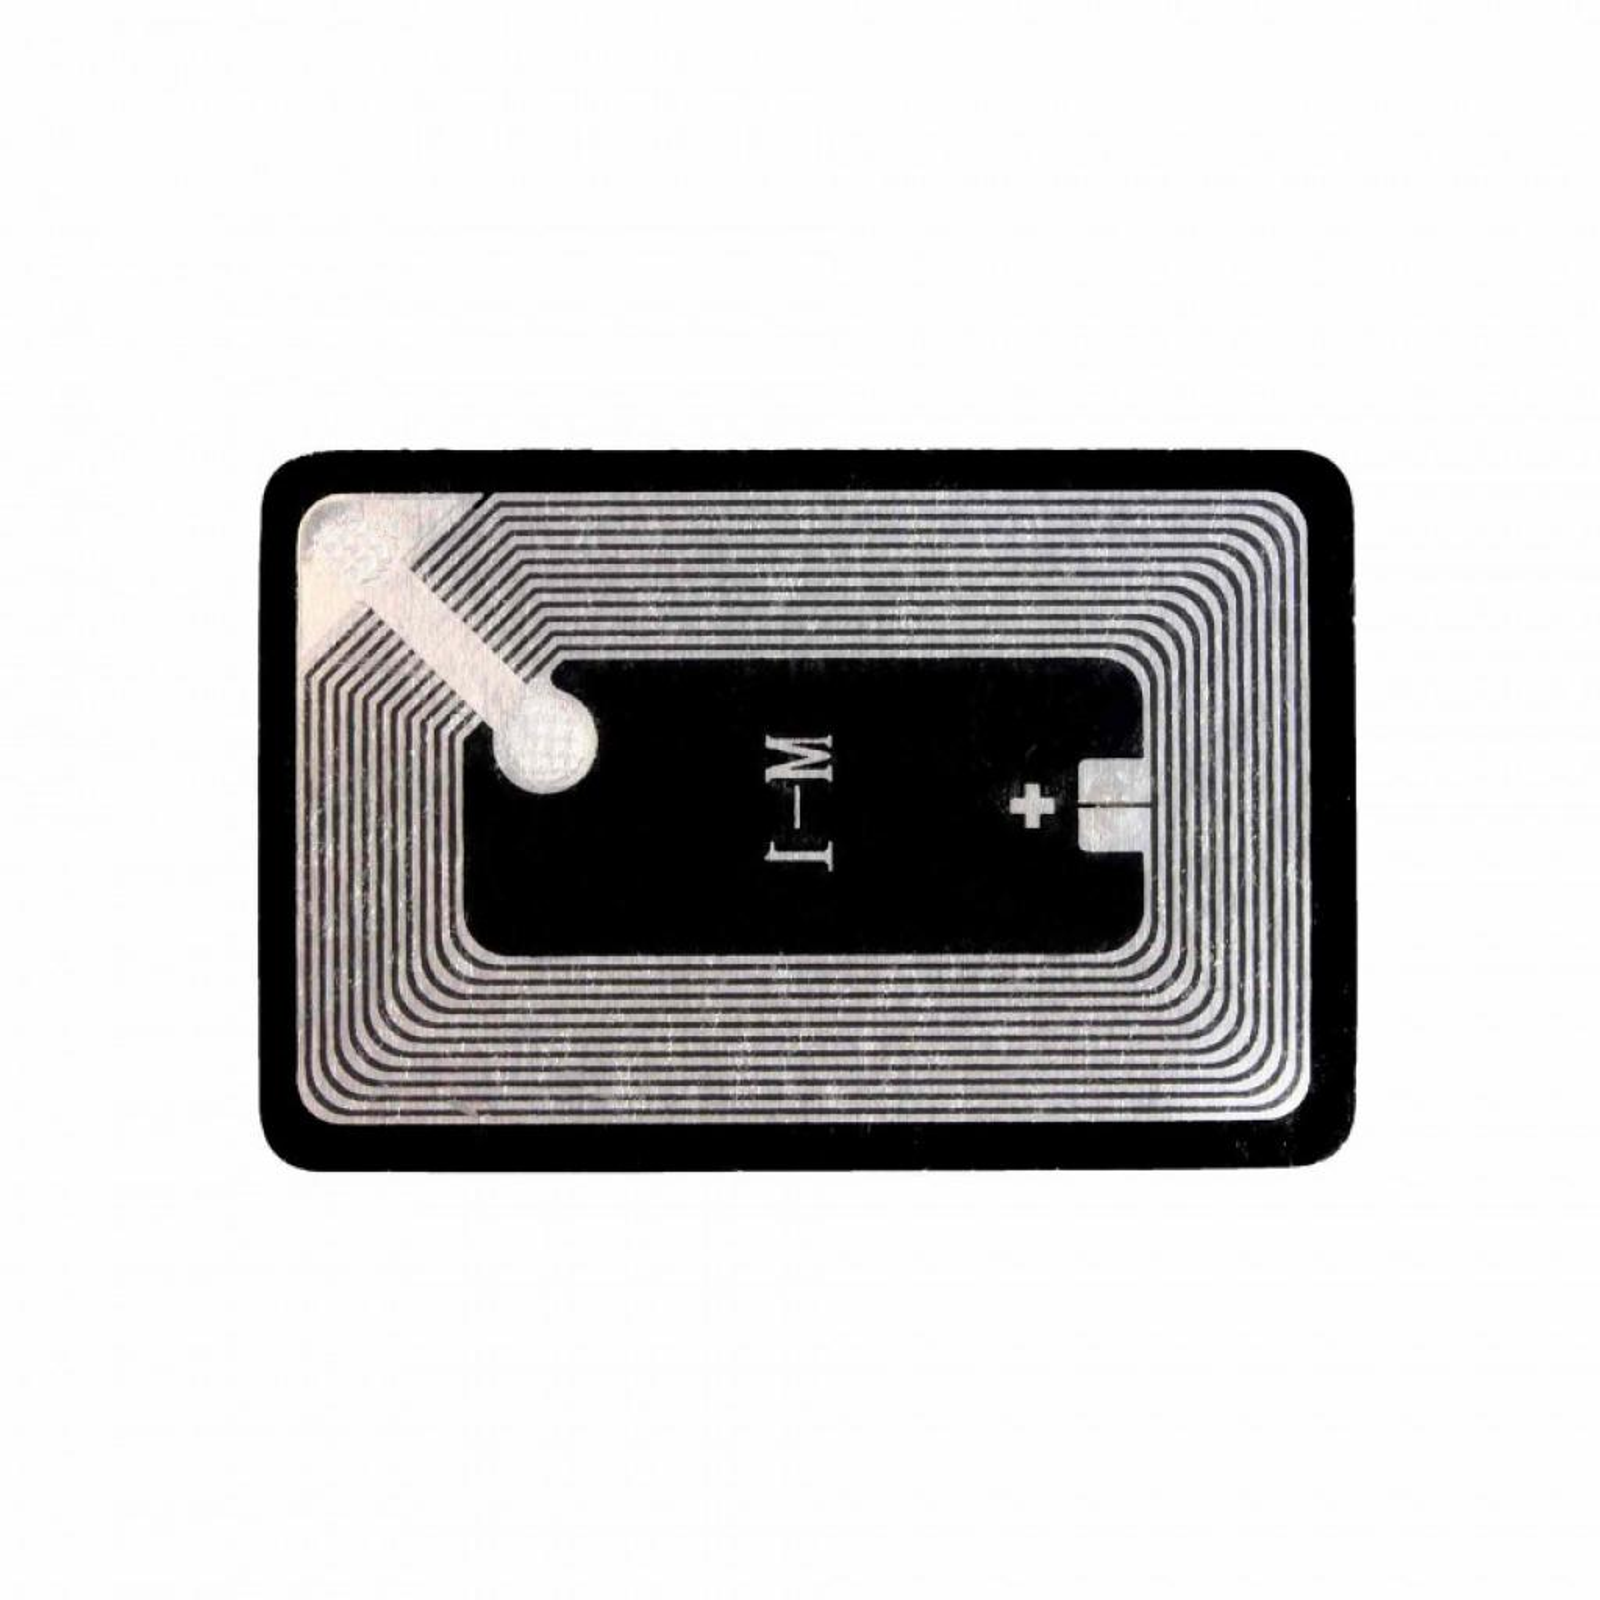 Чип для картриджа KyoceraFS-1120 (TK-160) (EU/MEA) 2.5k Static Control (TK160CHIP-EU)